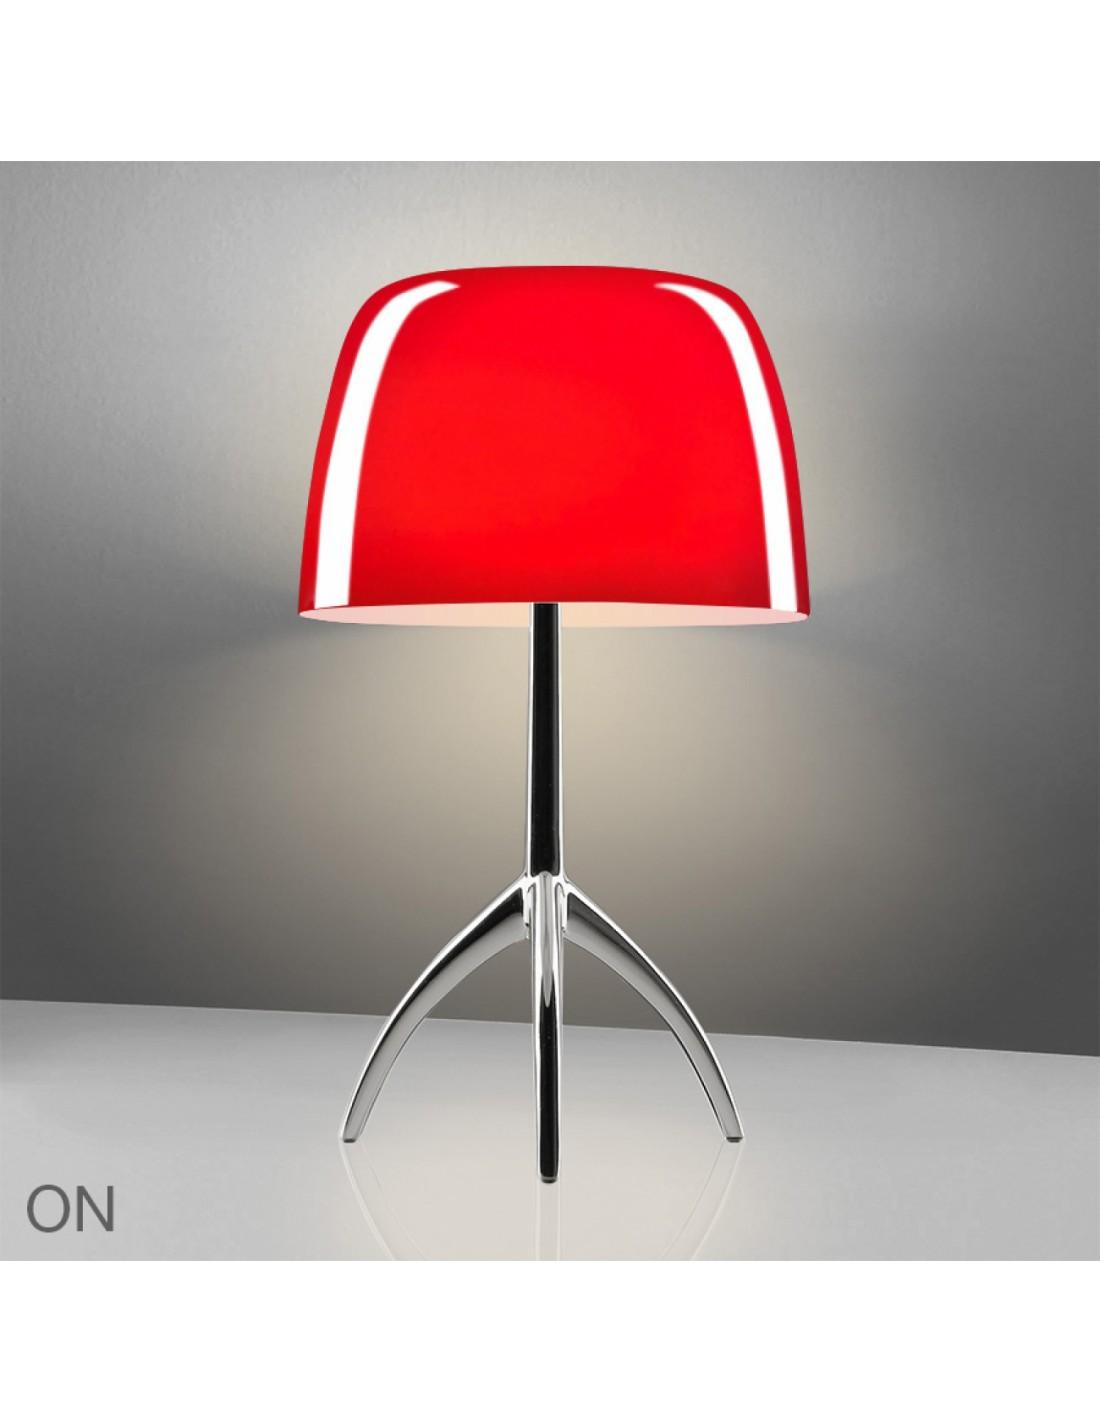 Lampe de table Lumière 05 Piccola Aluminium poli rouge